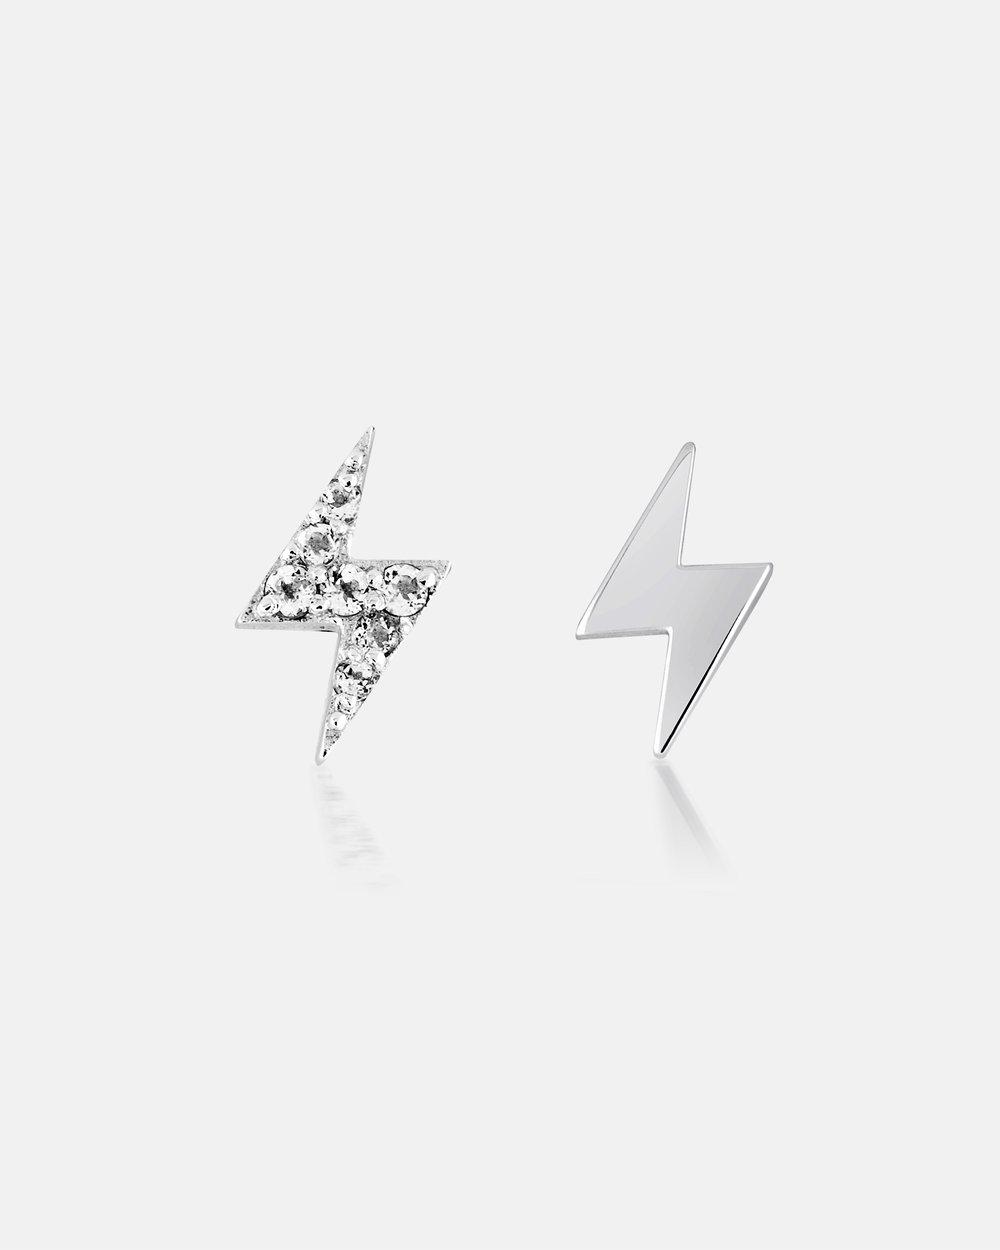 Lumiere Lightning Bolt Diamond Pave Silver Ear Studs By Au Revoir